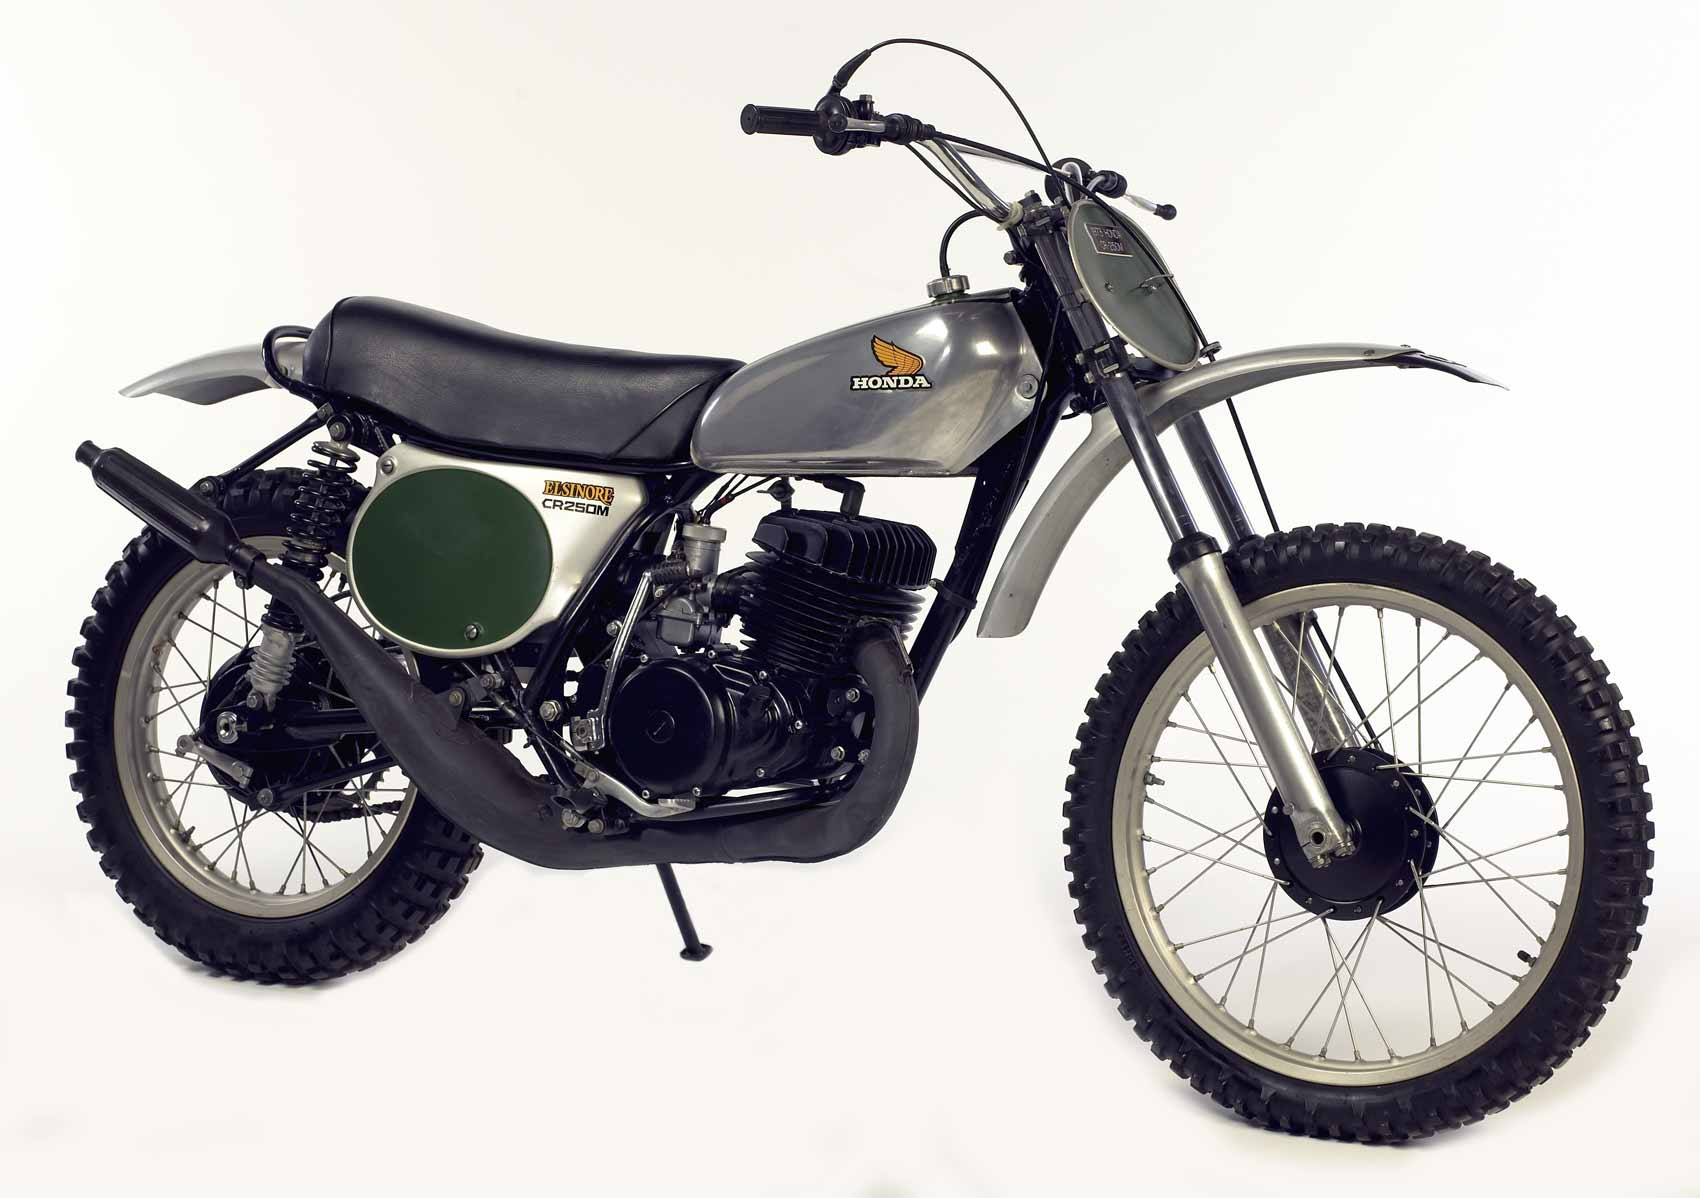 Honda planning retro scrambler?